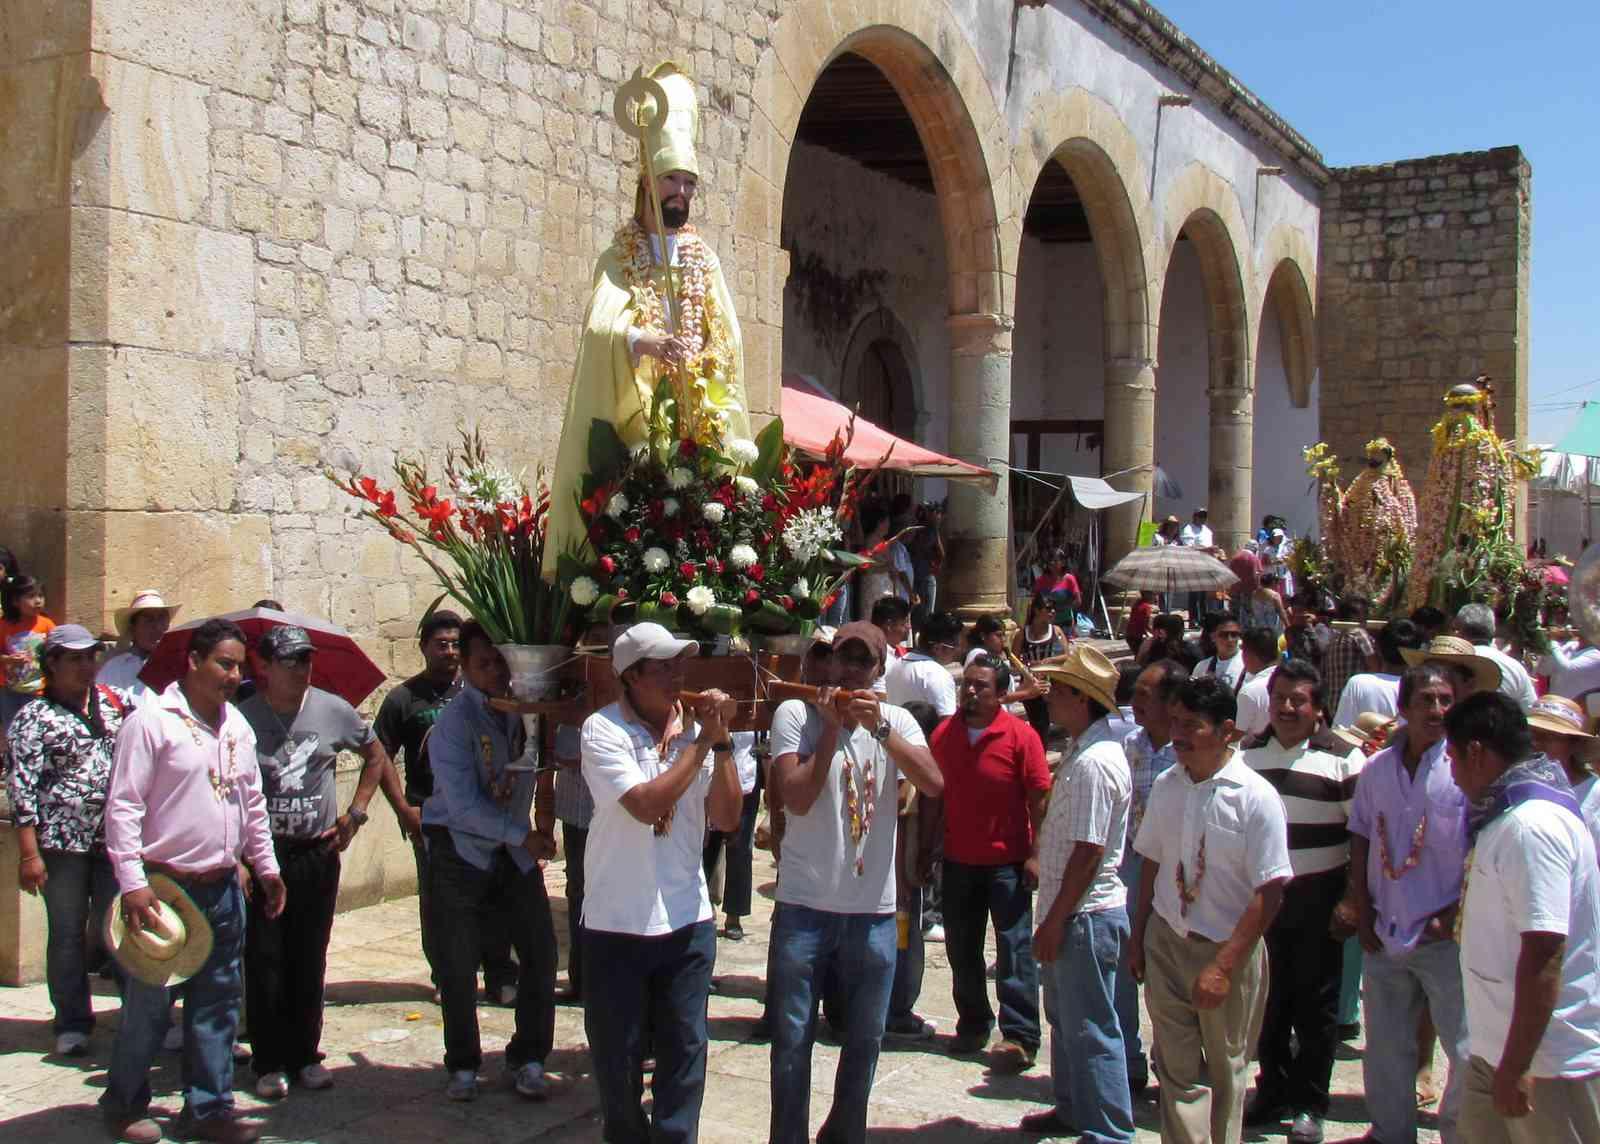 Easter celebration in Oaxaca, Mexico